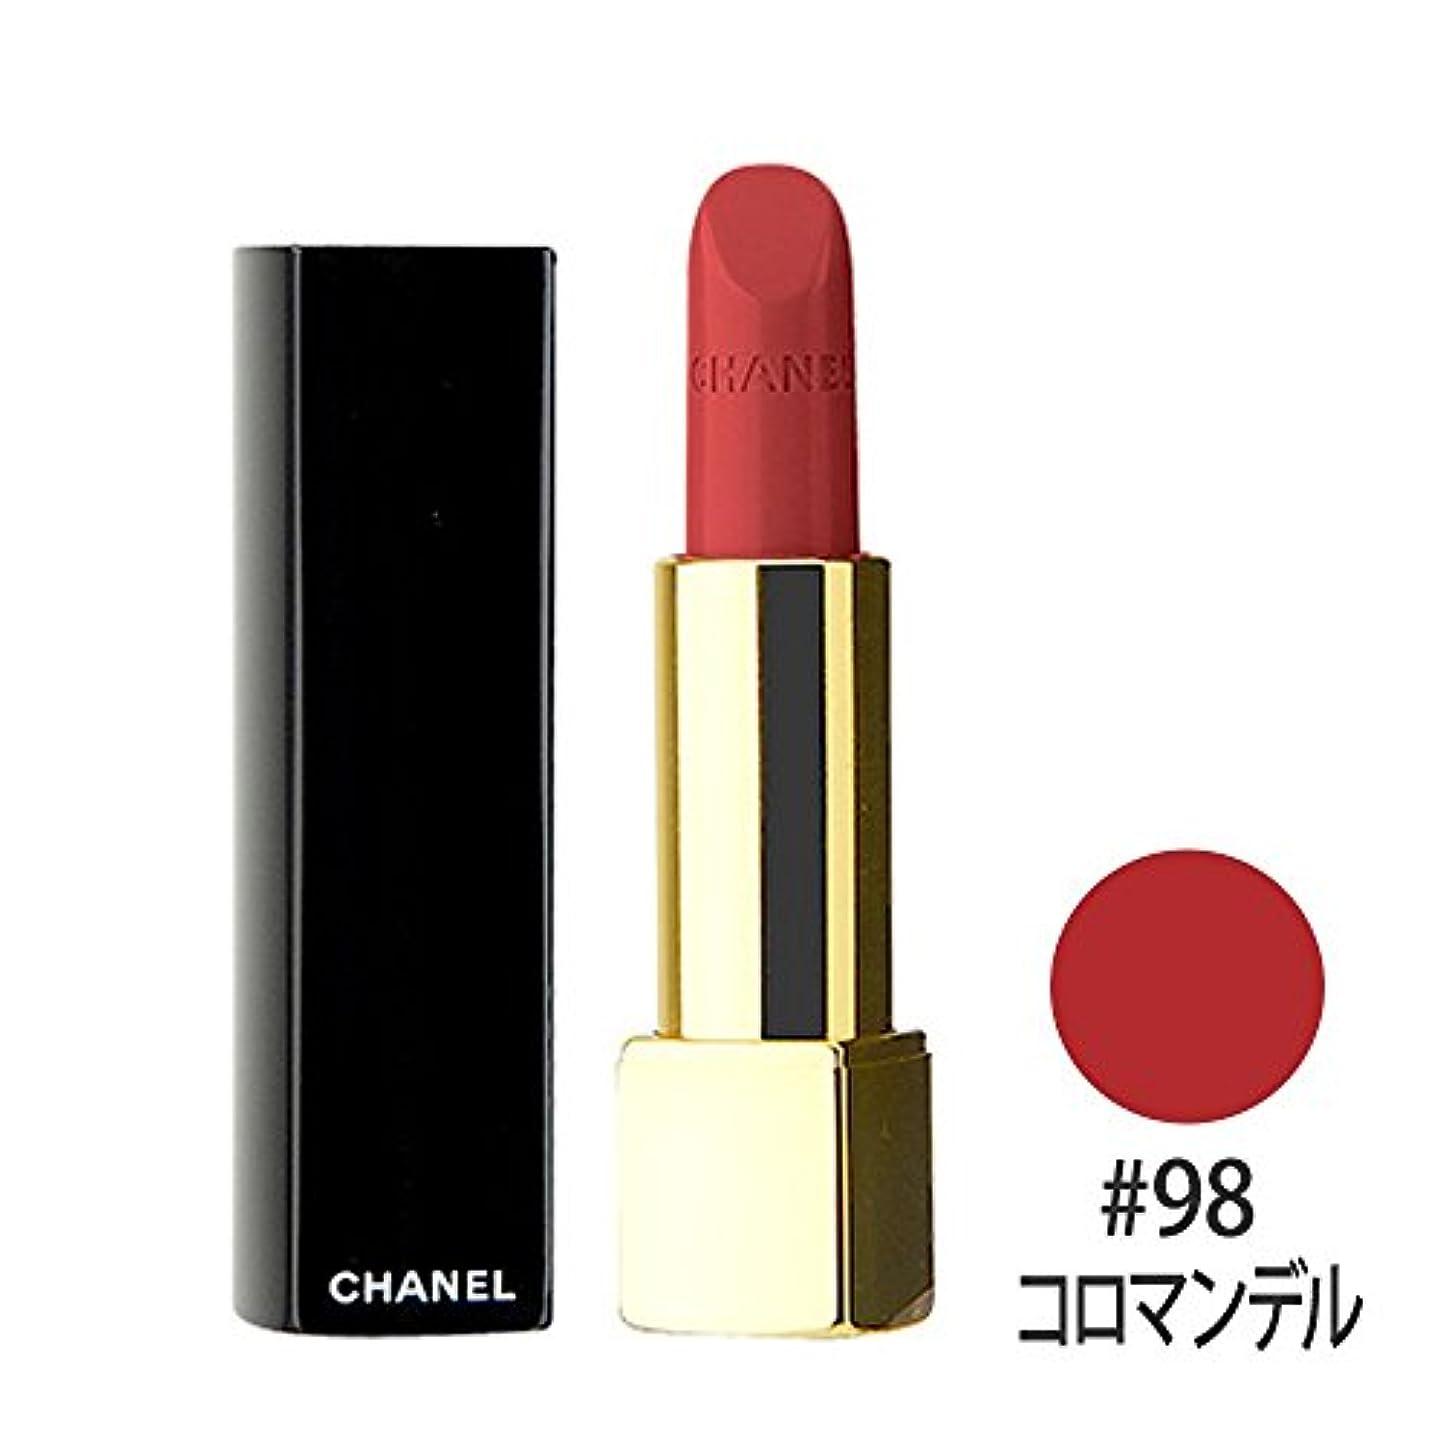 Chanel Rouge Allure Luminous Intense Lip Colour 98 Coromandel [並行輸入品]